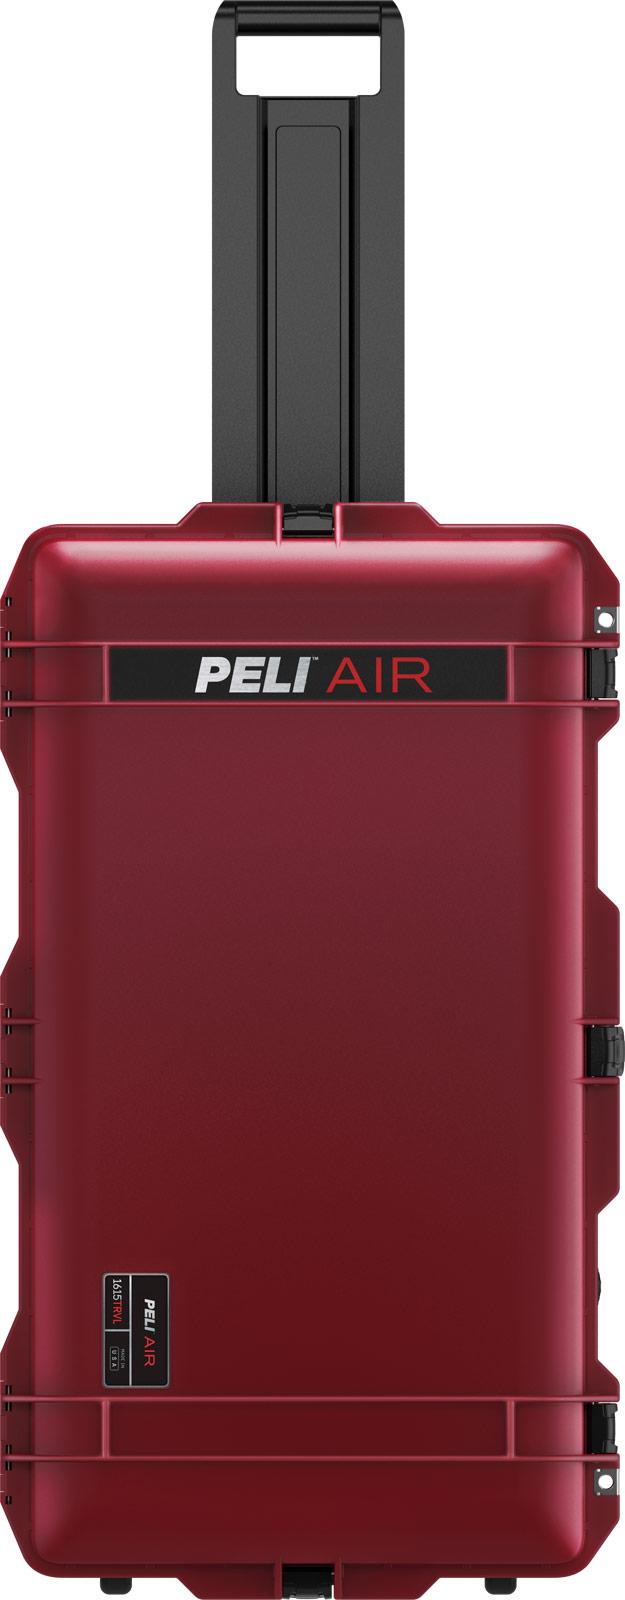 peli organizational air travel case